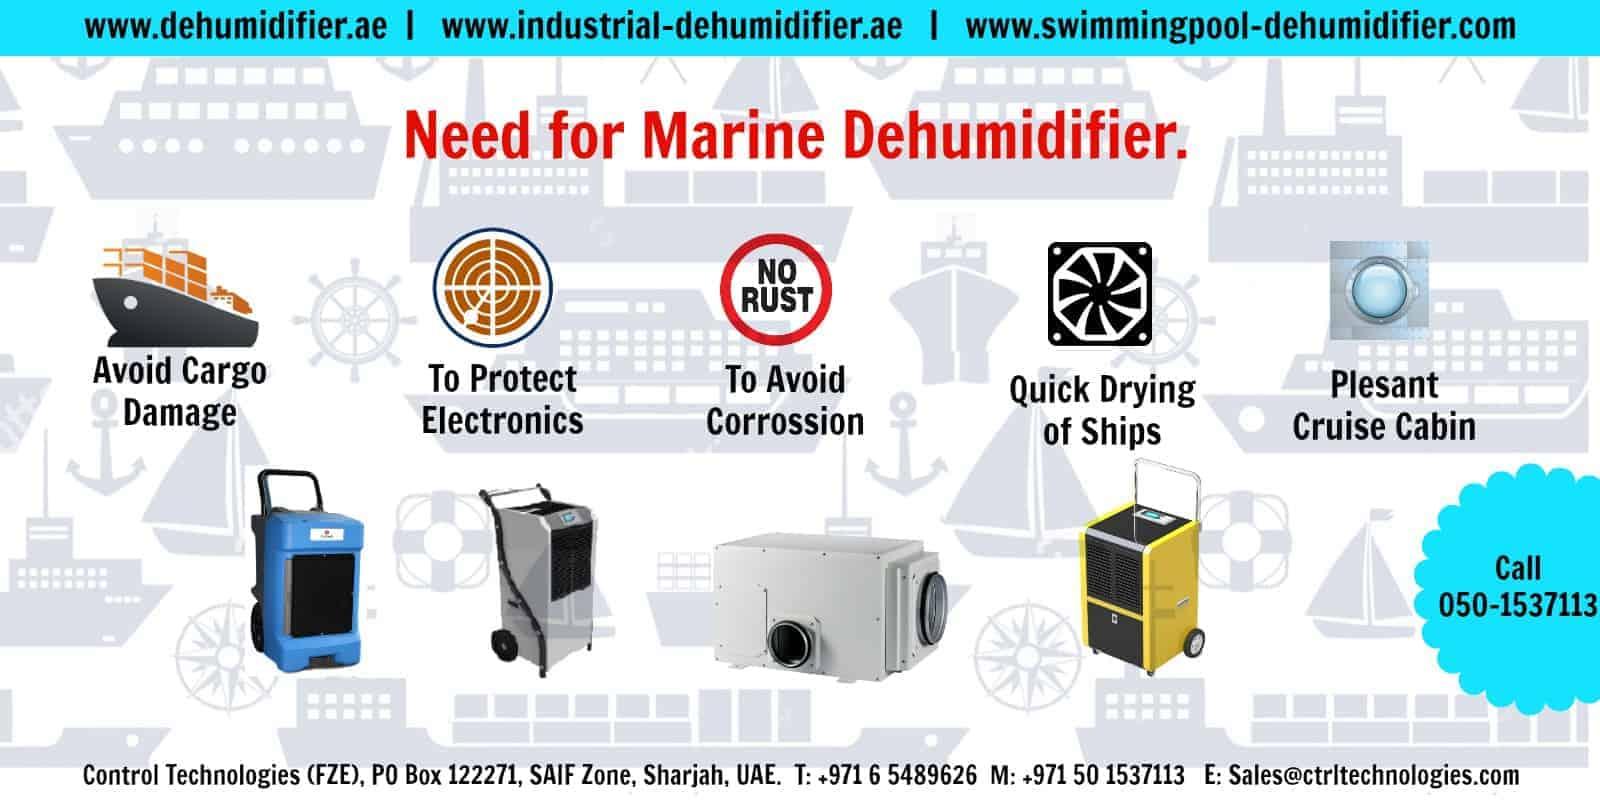 Marine dehumidifier; Why it is needed for dehumidification?